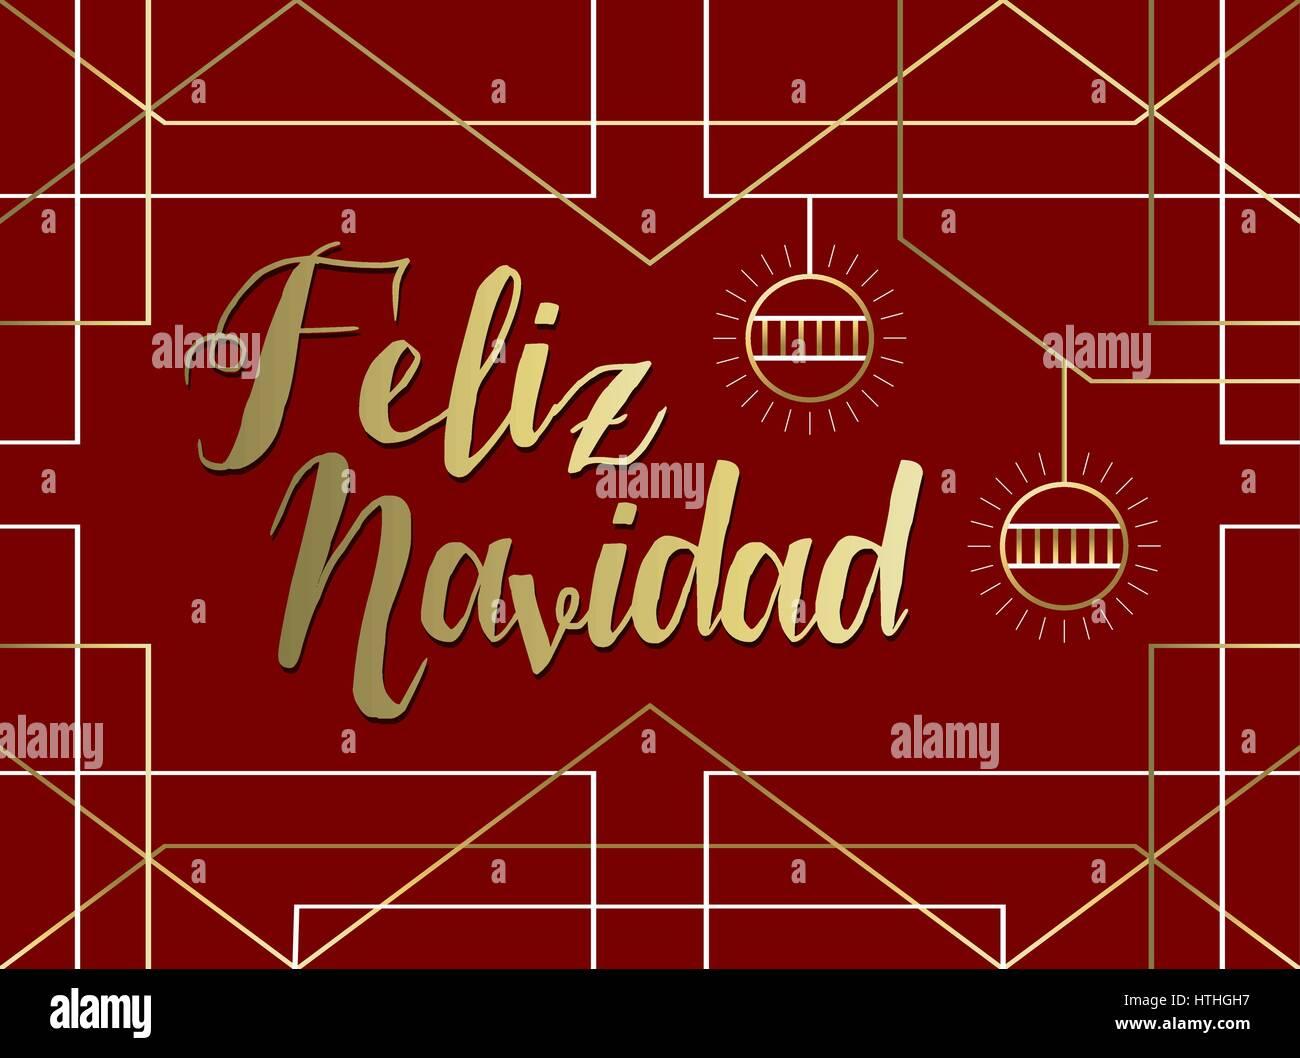 Greeting card in spanish stock photos greeting card in spanish merry christmas greeting card in spanish language feliz navidad gold art deco geometry style with m4hsunfo